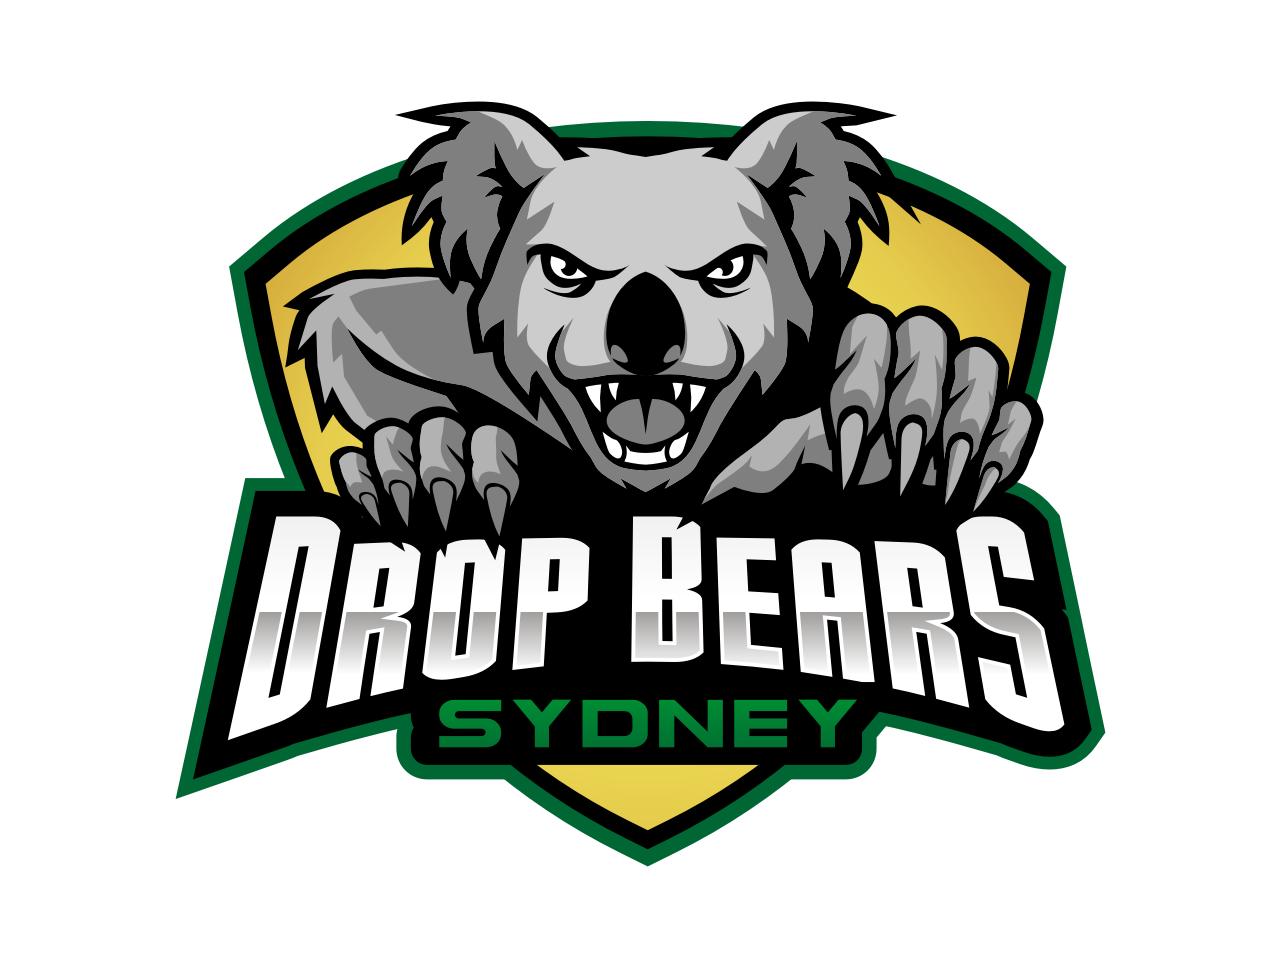 Sydney Drop Bears